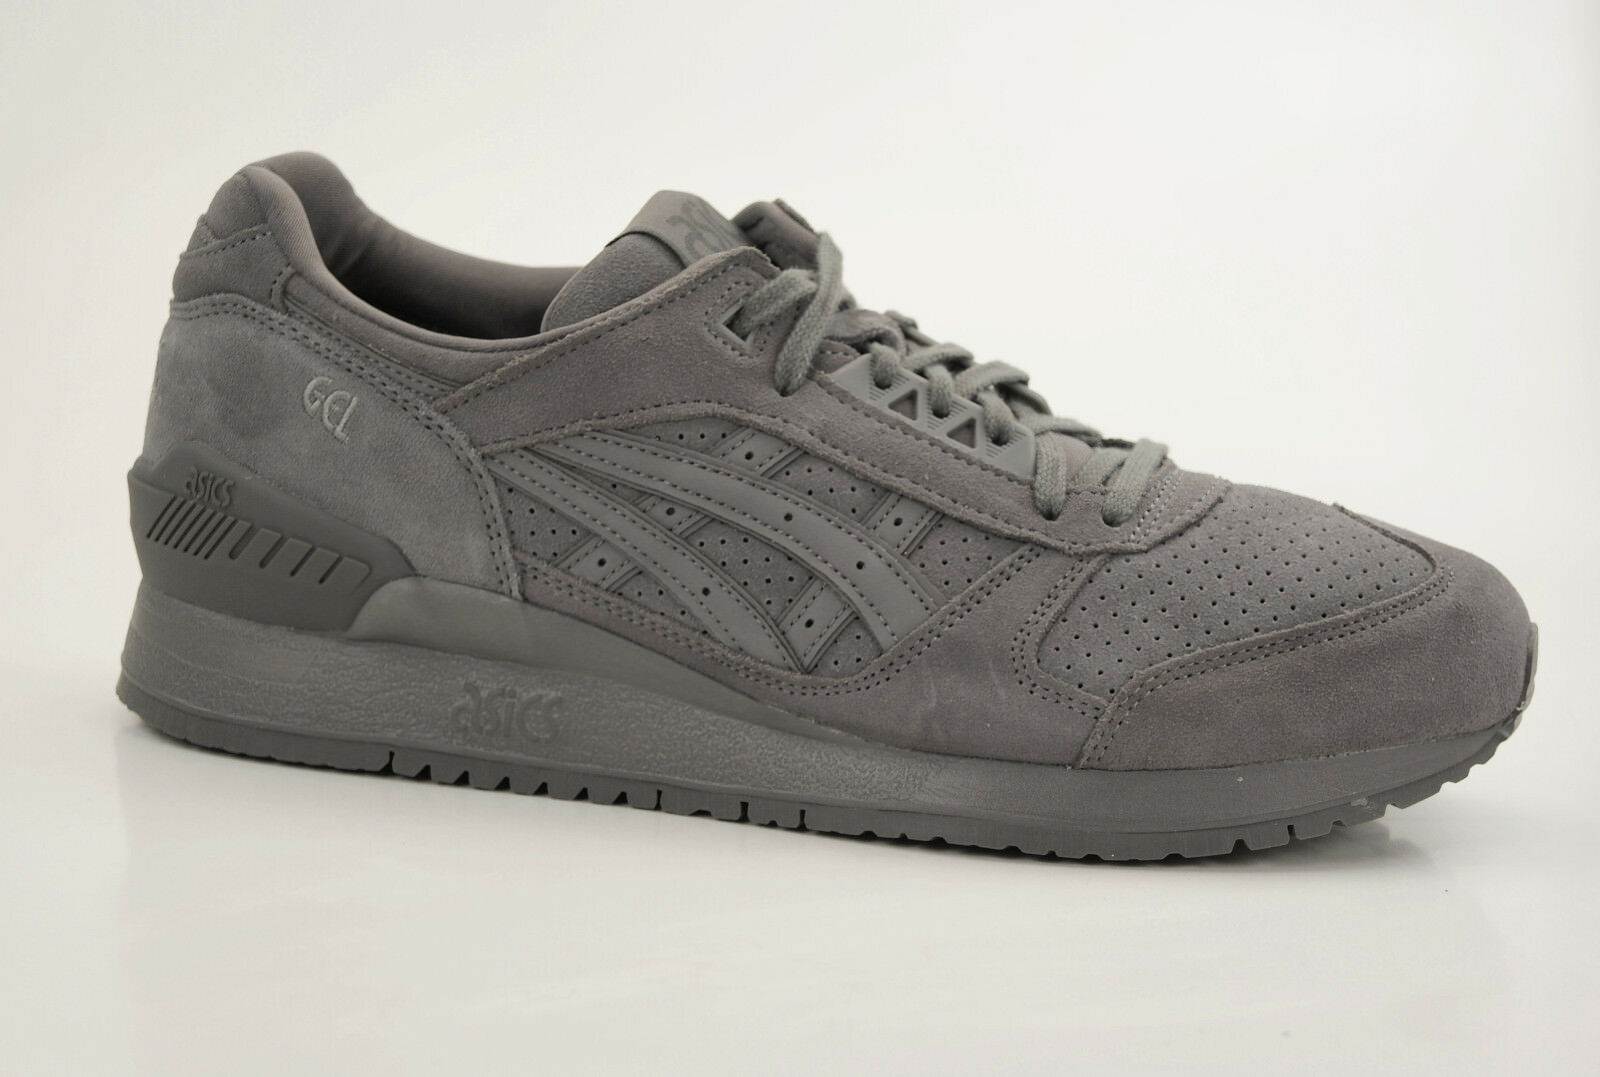 Asics Gel-respector Carbone Chaussures De Sport Chaussures Hommes Baskets h721l-9797